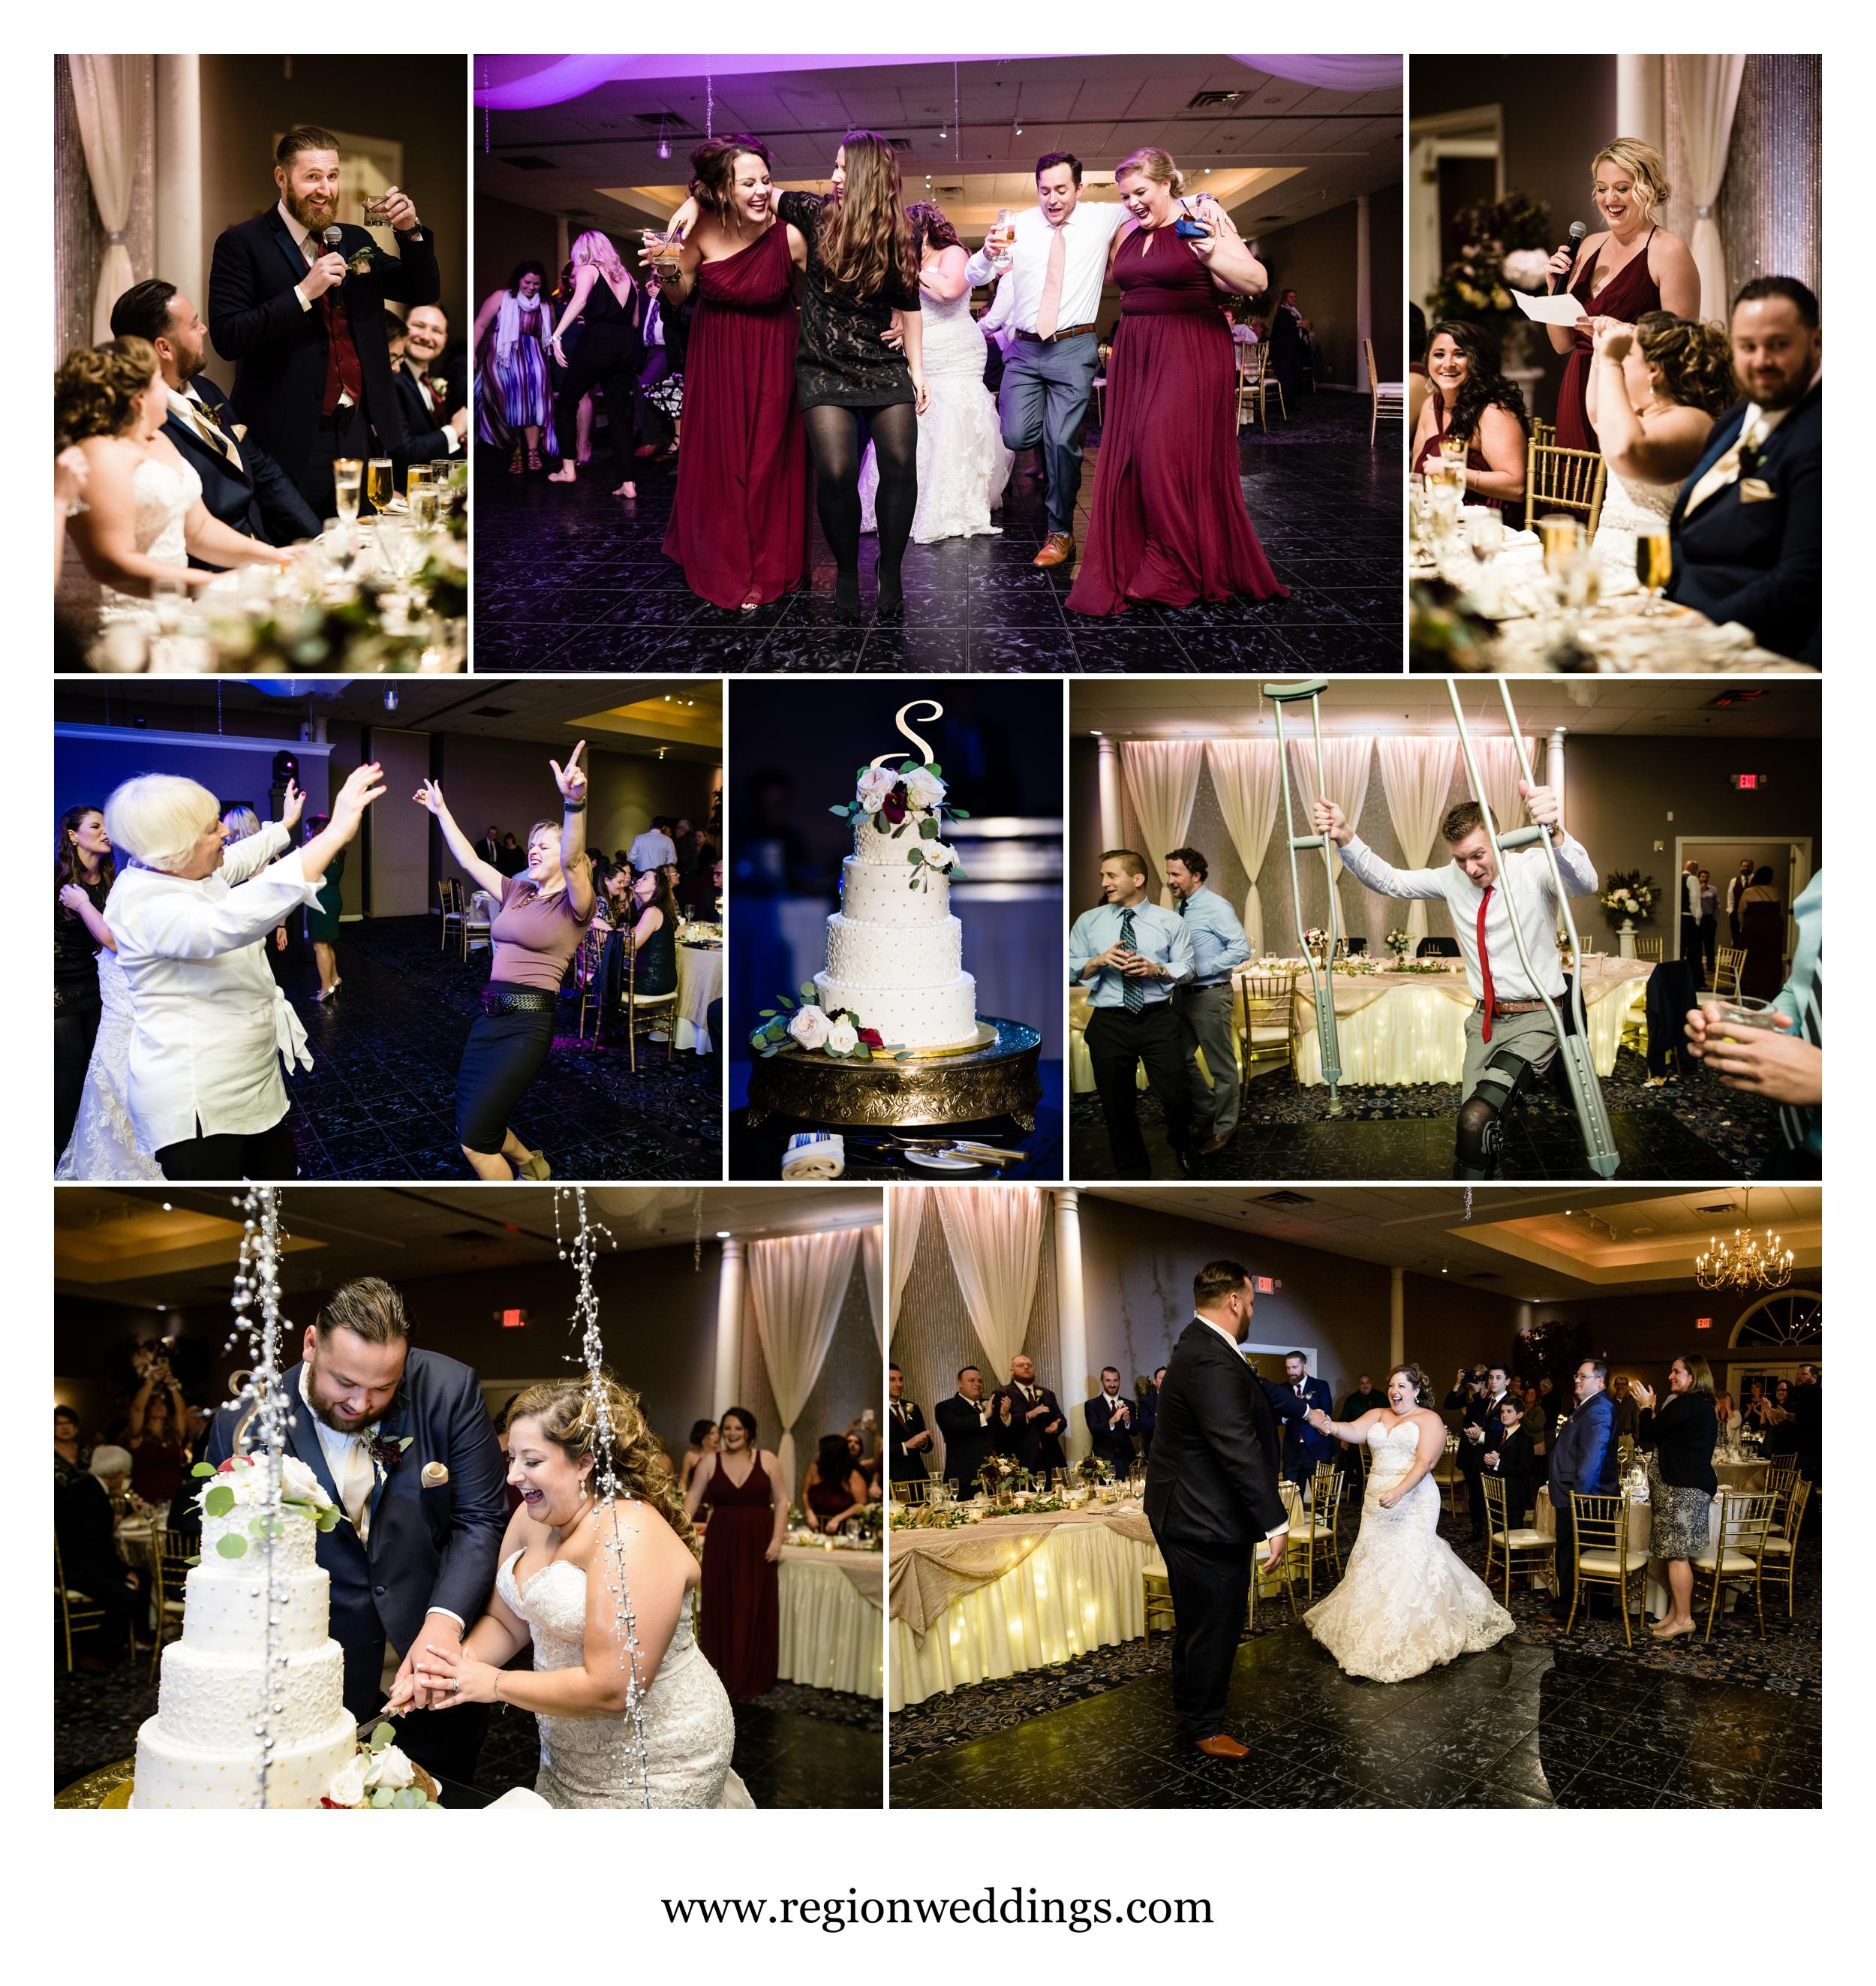 Wedding reception fun at Aberdeen Manor.